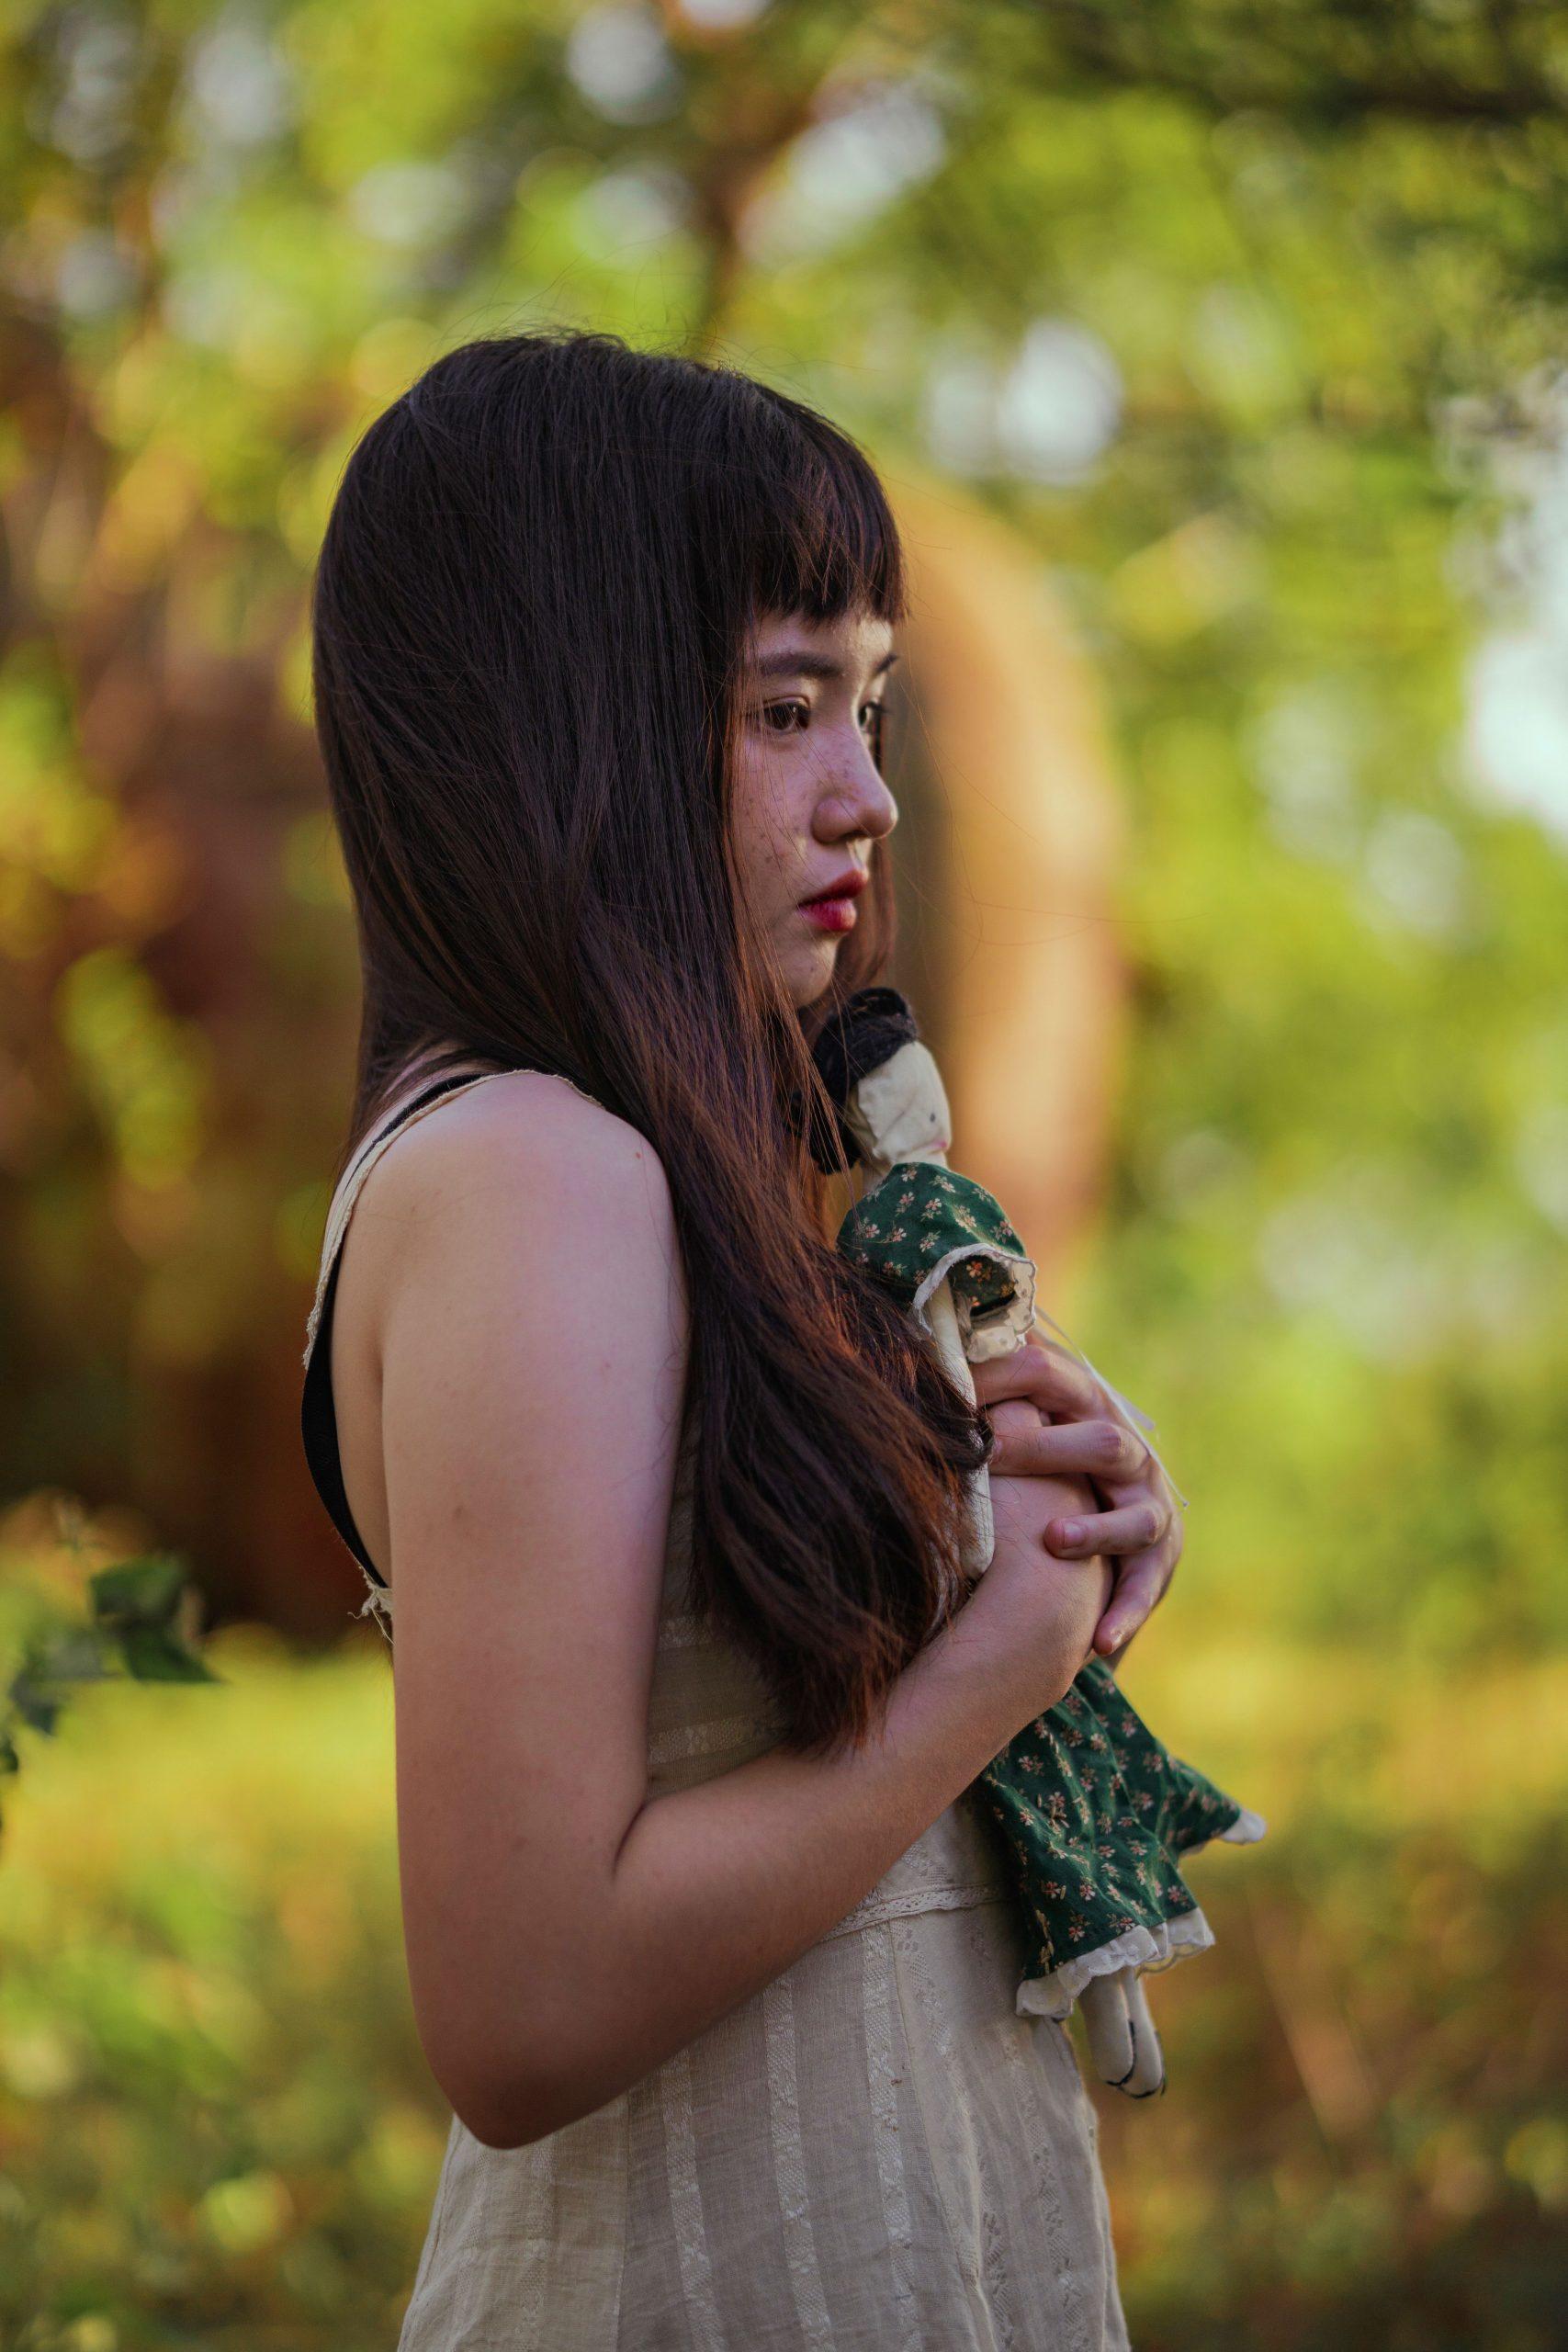 New Sad Girl Whatsapp Dp Images photo hd